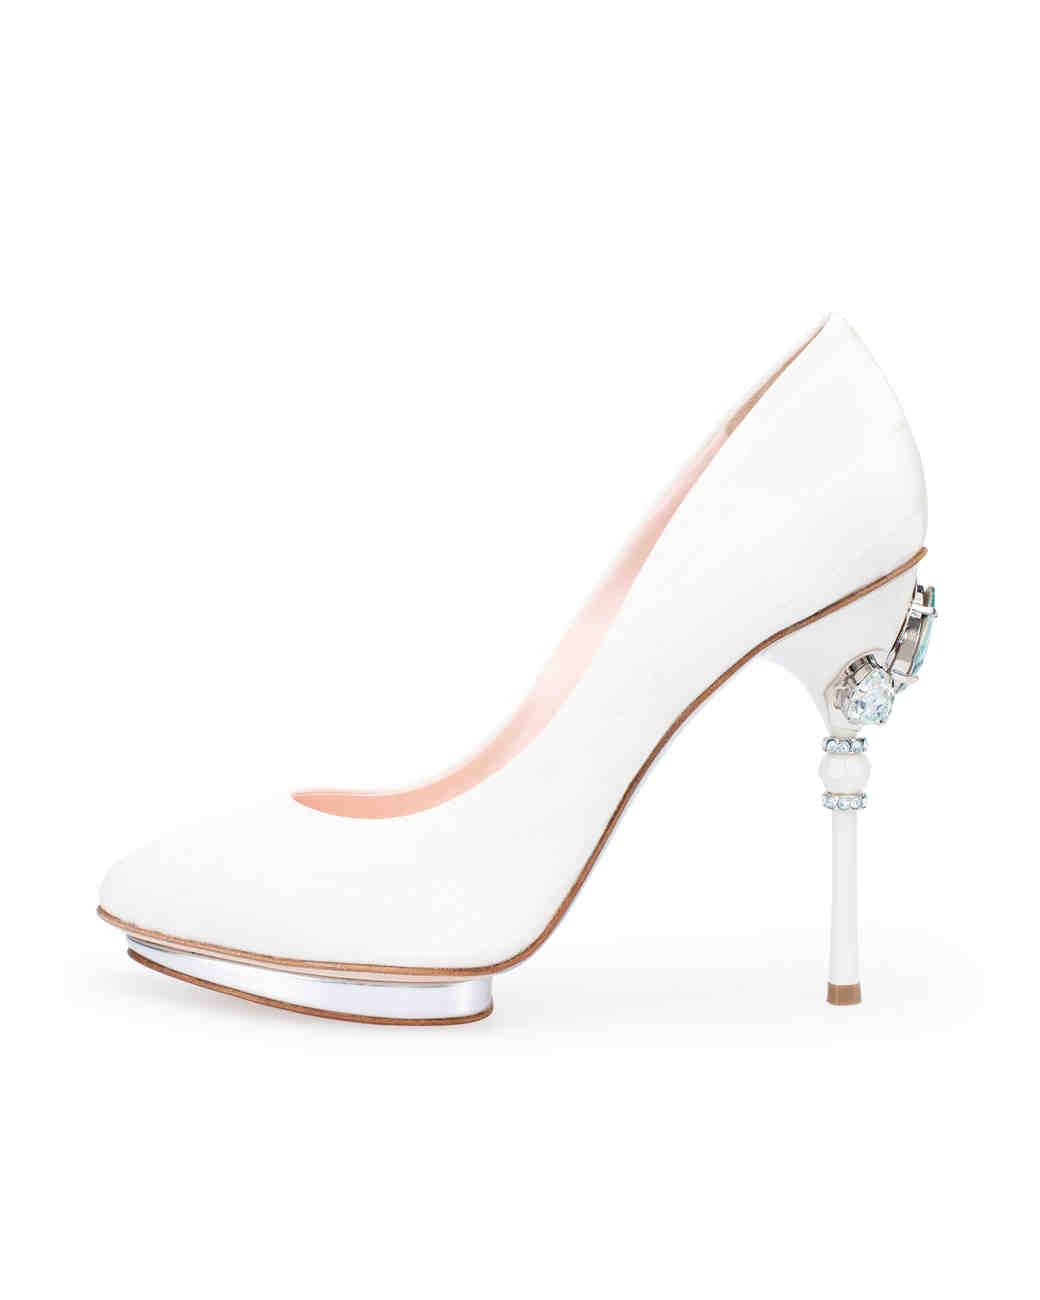 oscar-de-la-renta-shoe-bridal-market-ss17-0416.jpg